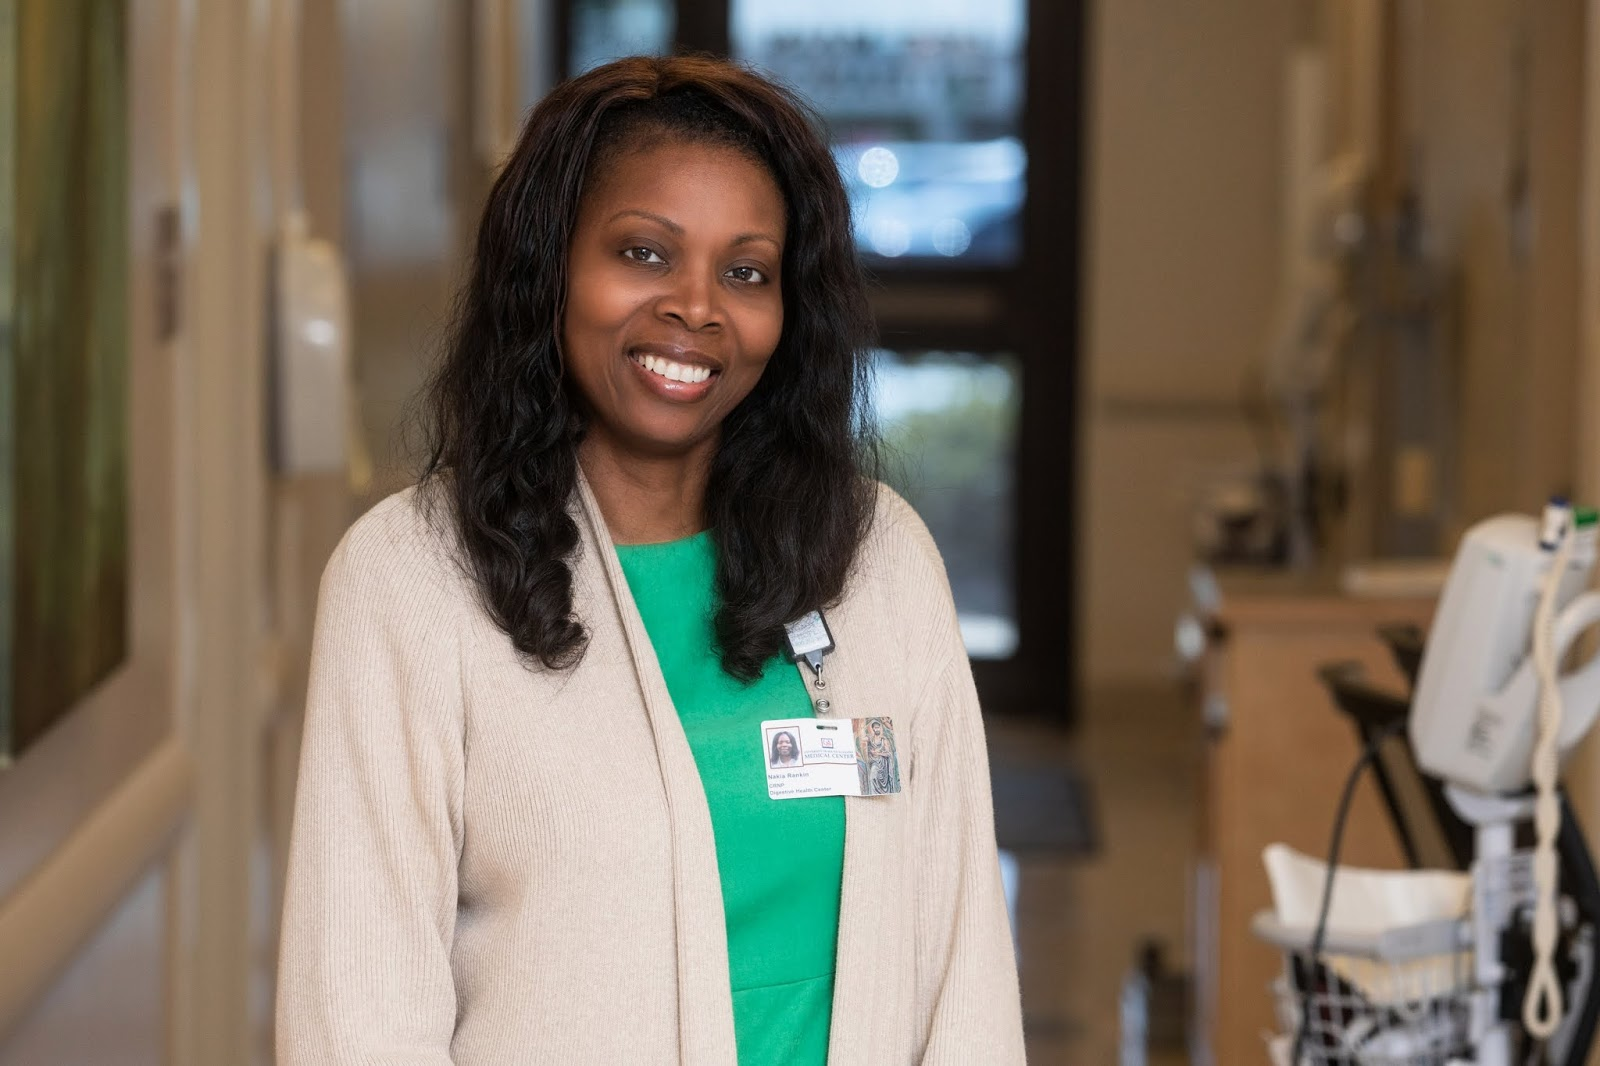 Med School Watercooler: Nurse practitioner Nakia Rankin